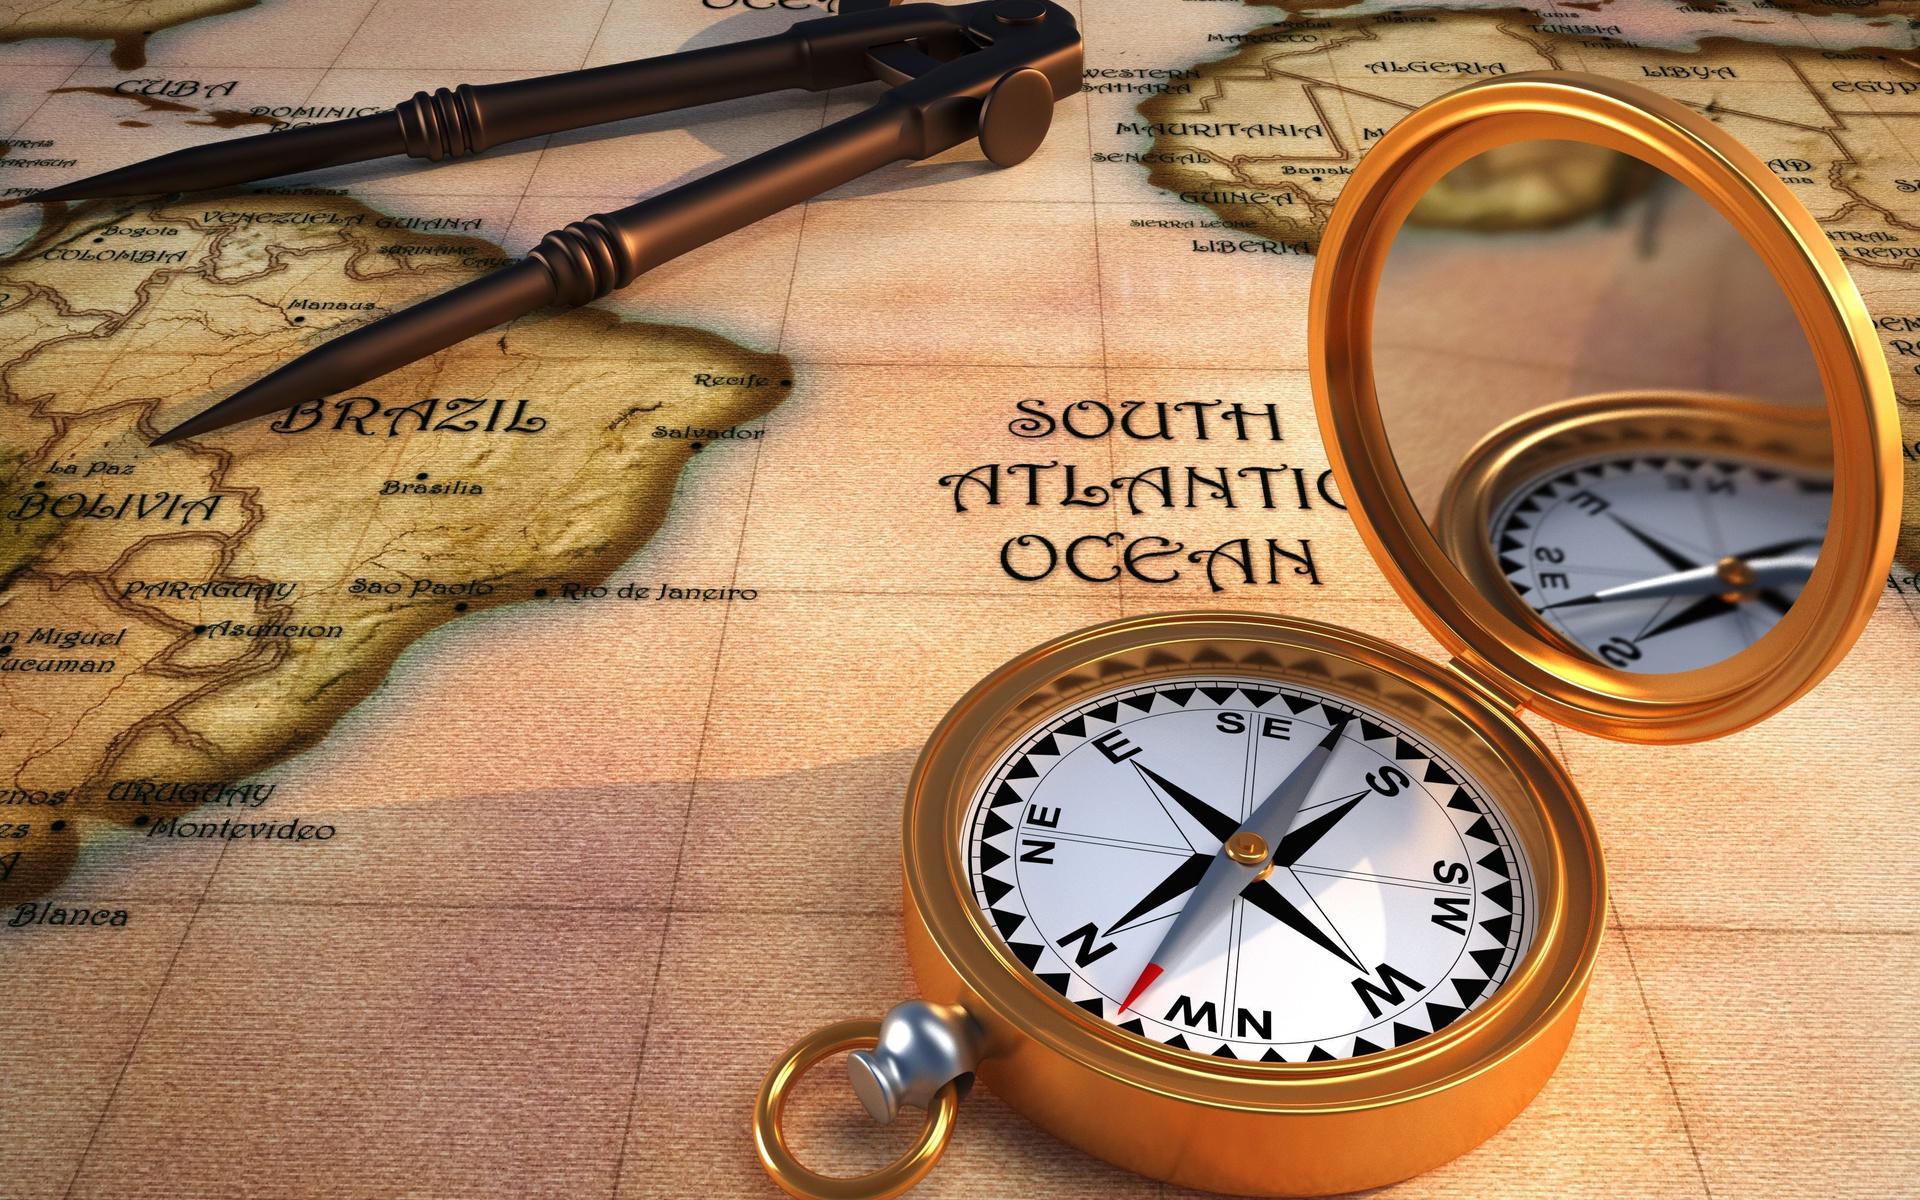 карта, компас